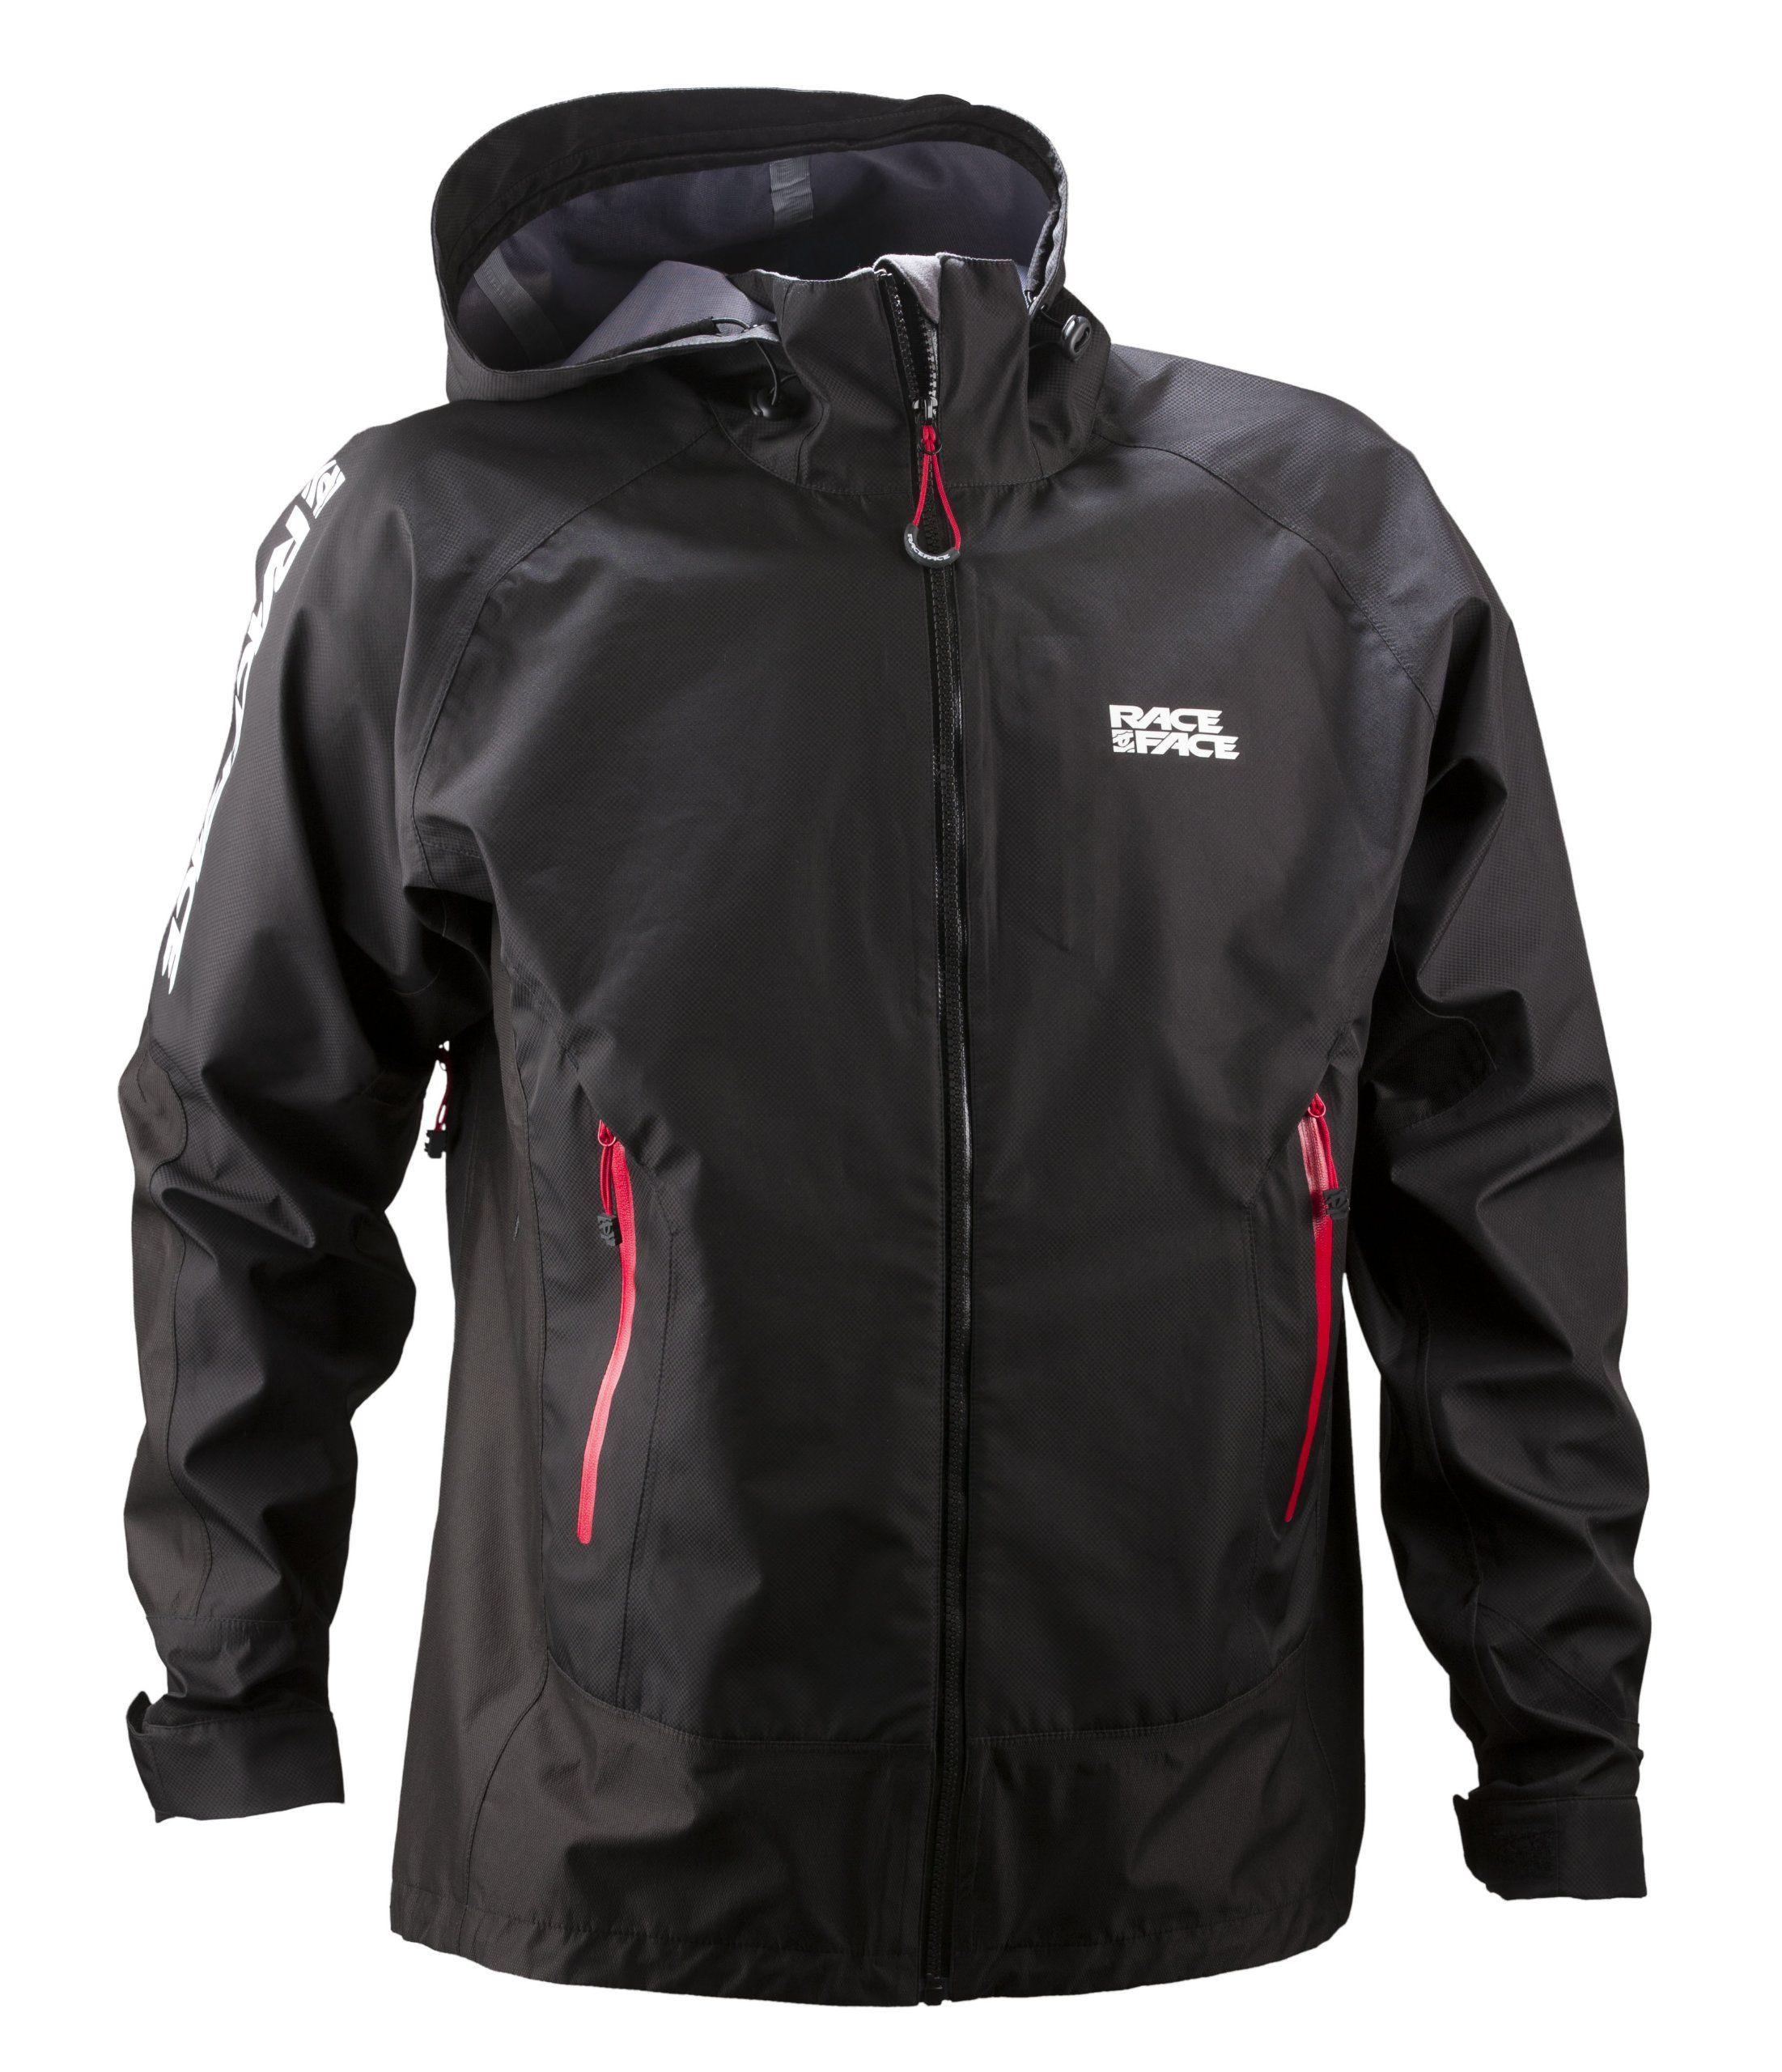 Race Face Chute Waterproof Jacket, Black, Large